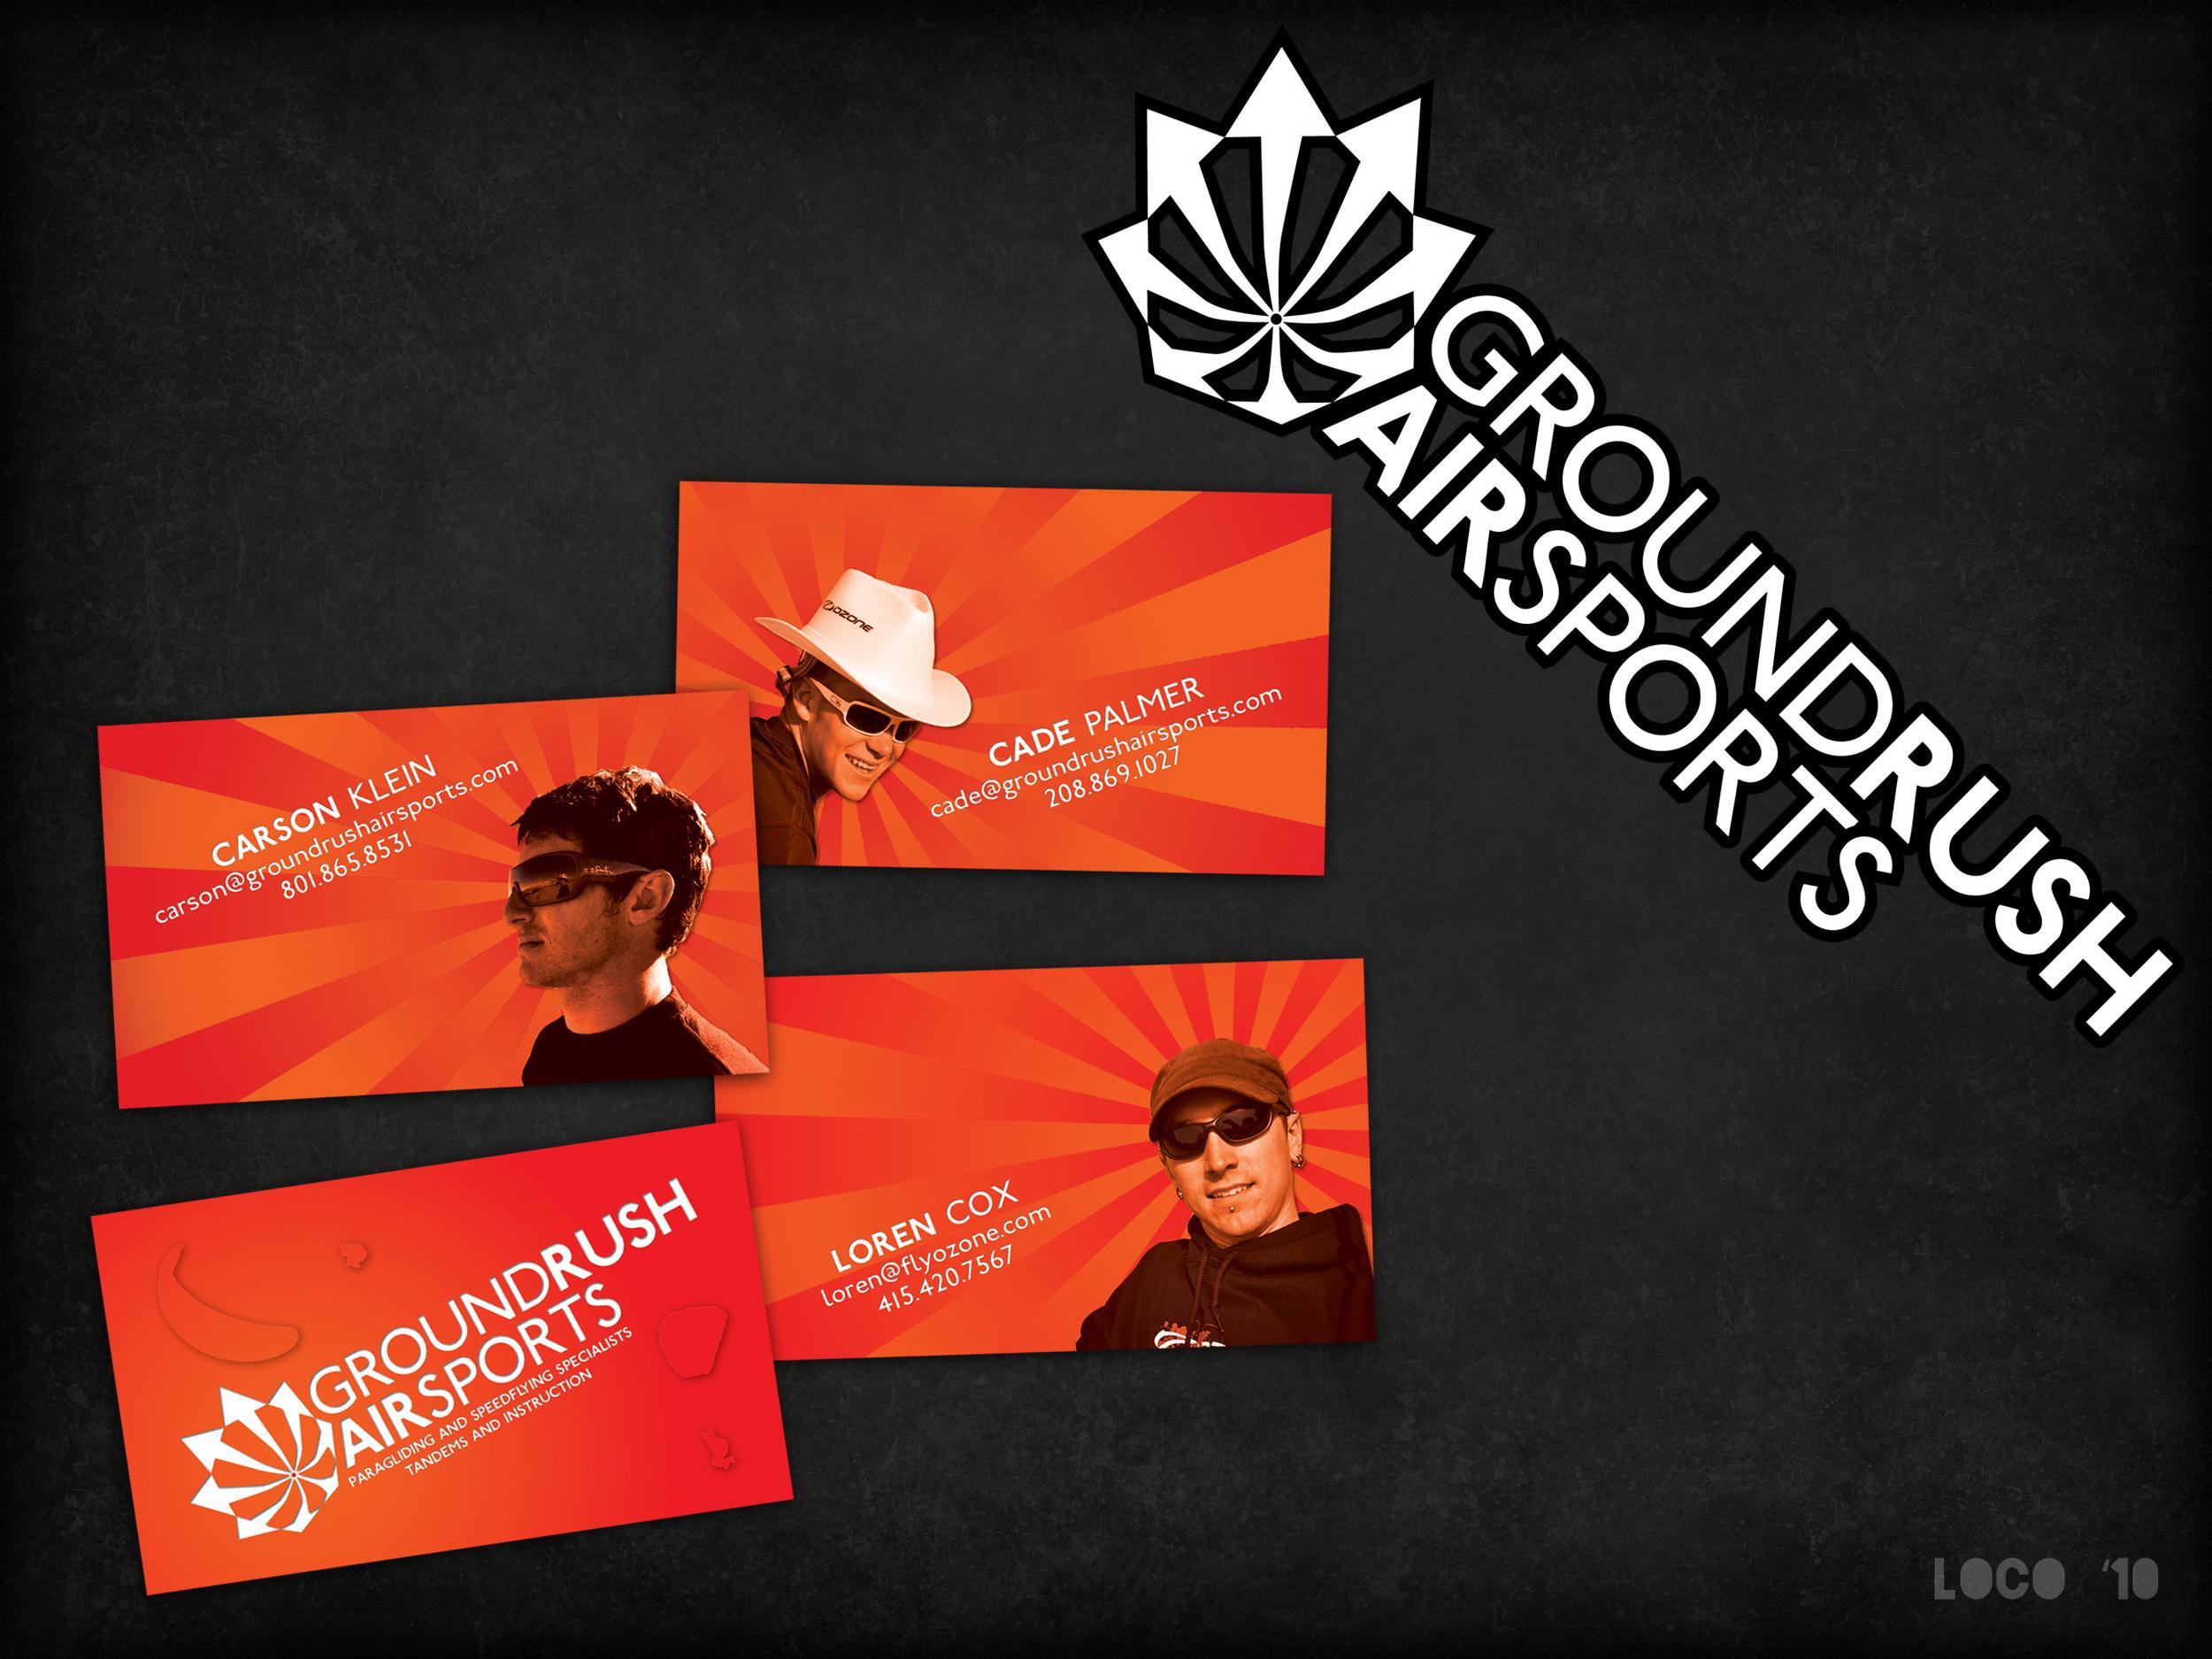 Ground Rush Cards and Logo.jpg